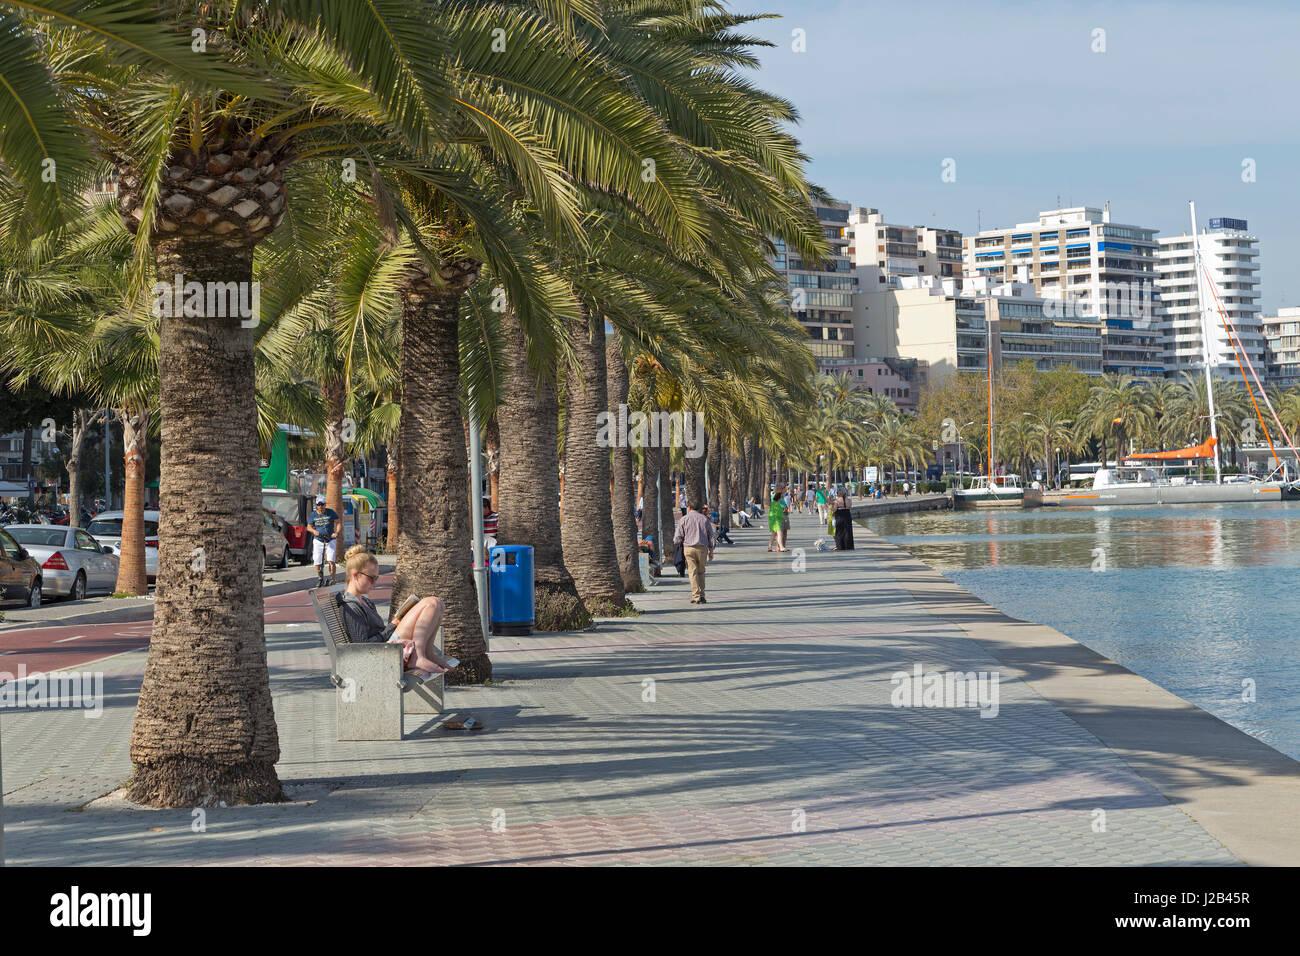 direkt am Meer in Palma De Mallorca, Spanien Stockbild